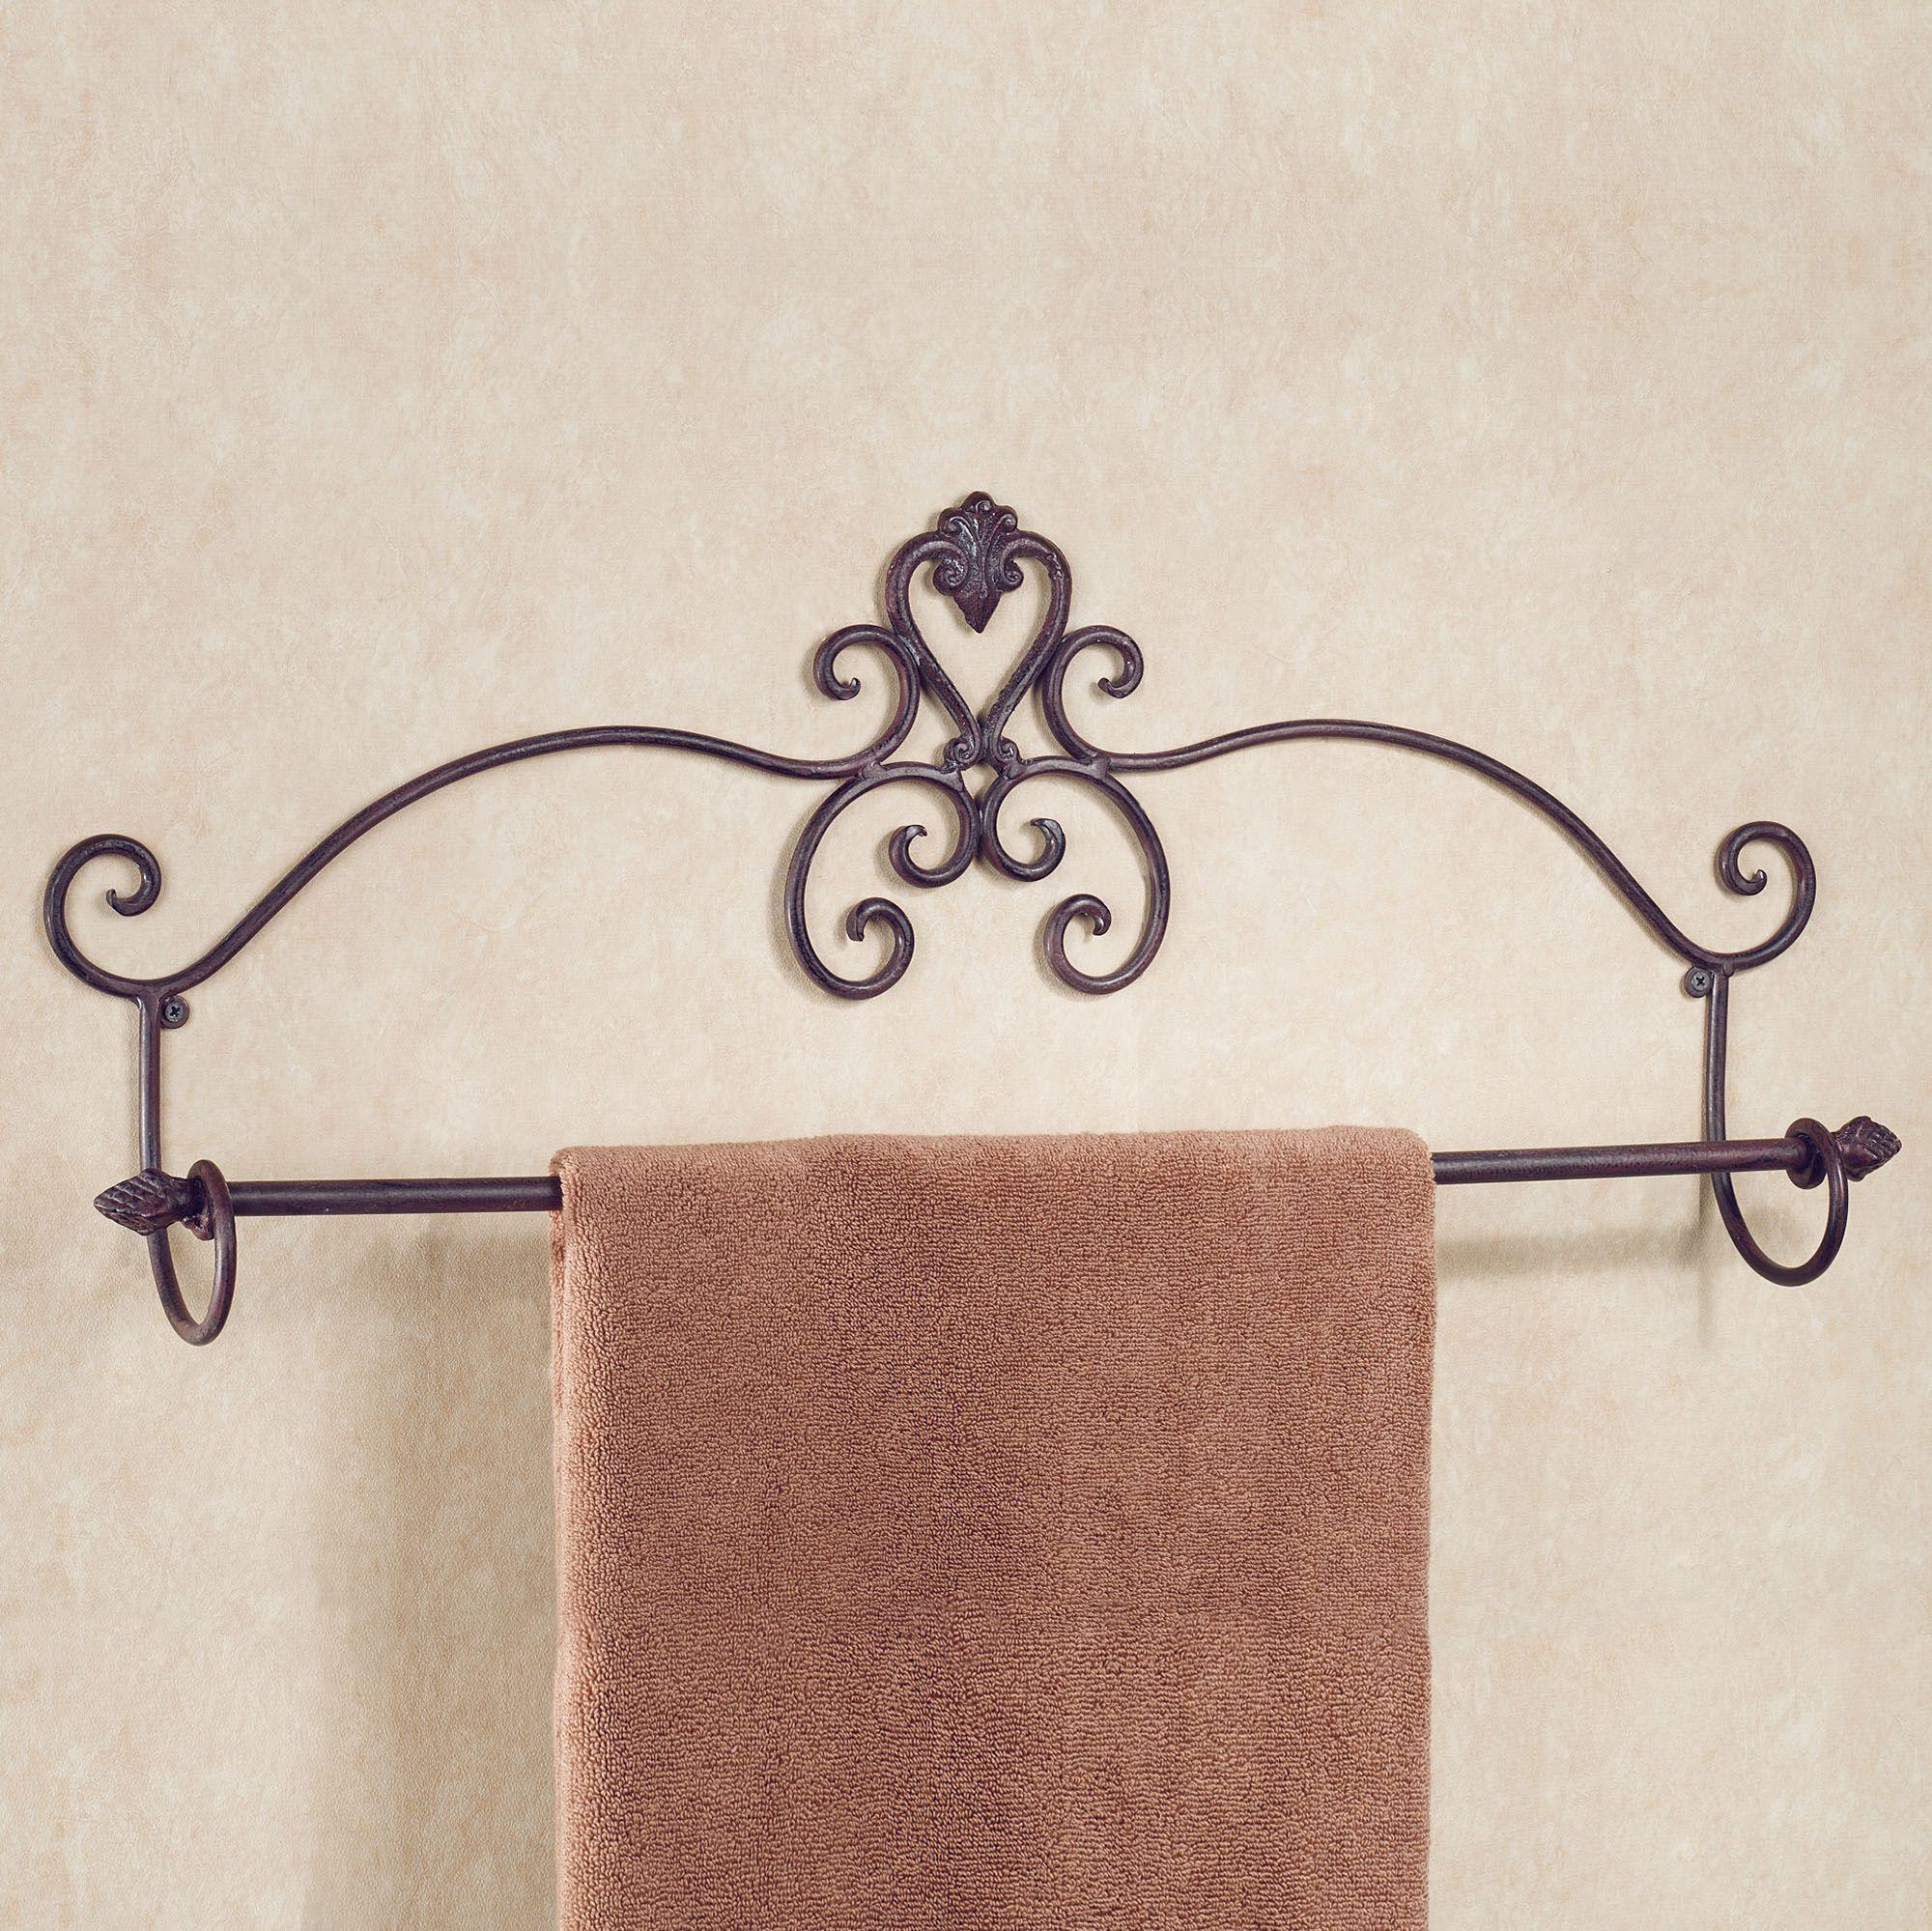 Aldabella scroll tuscan slate wall towel bar for Wrought iron bathroom towel bars